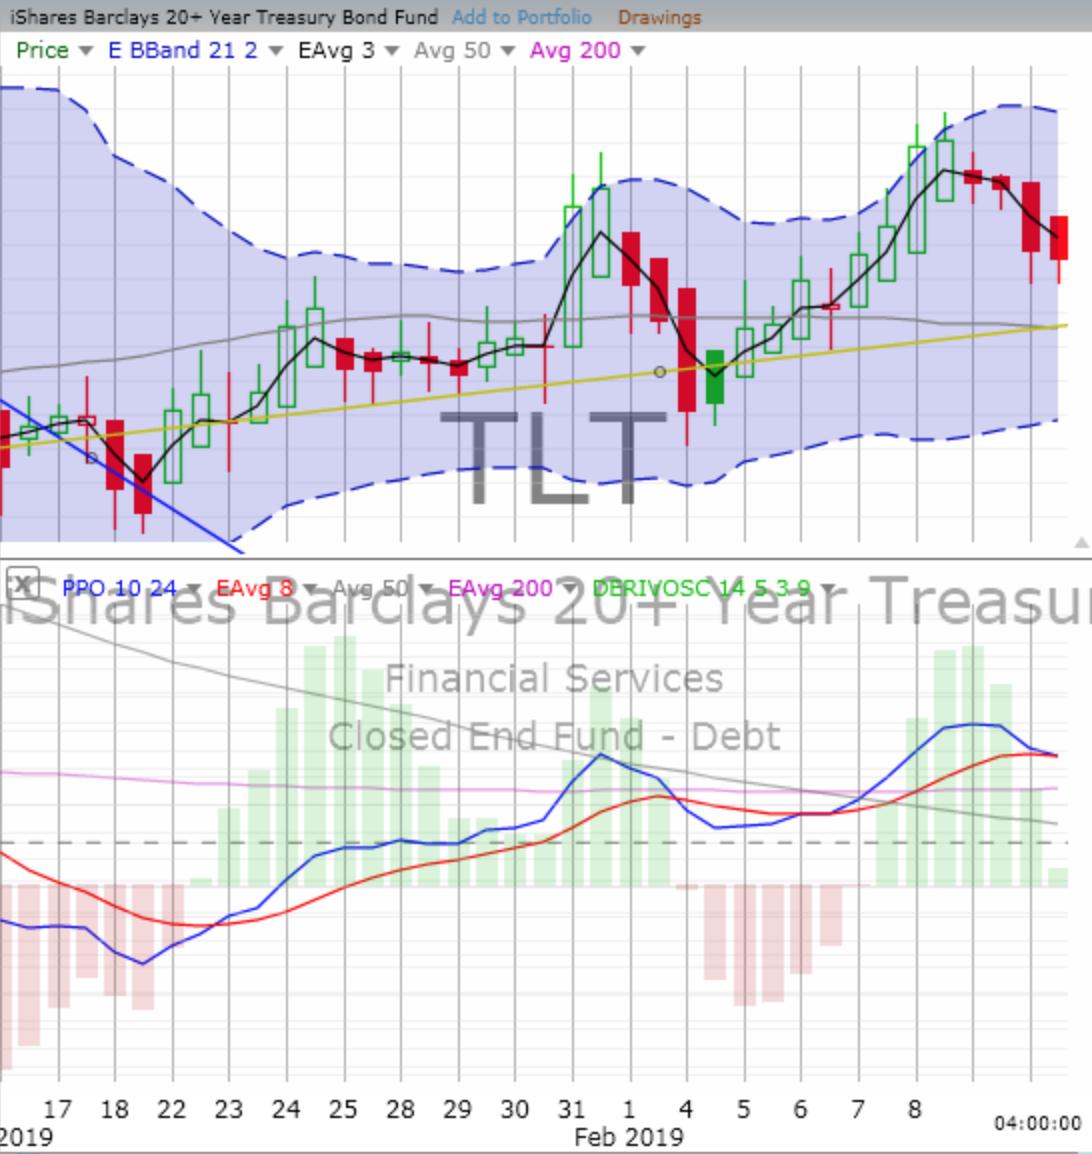 Wednesday, February 13, 2019, Stock Trading: Chart